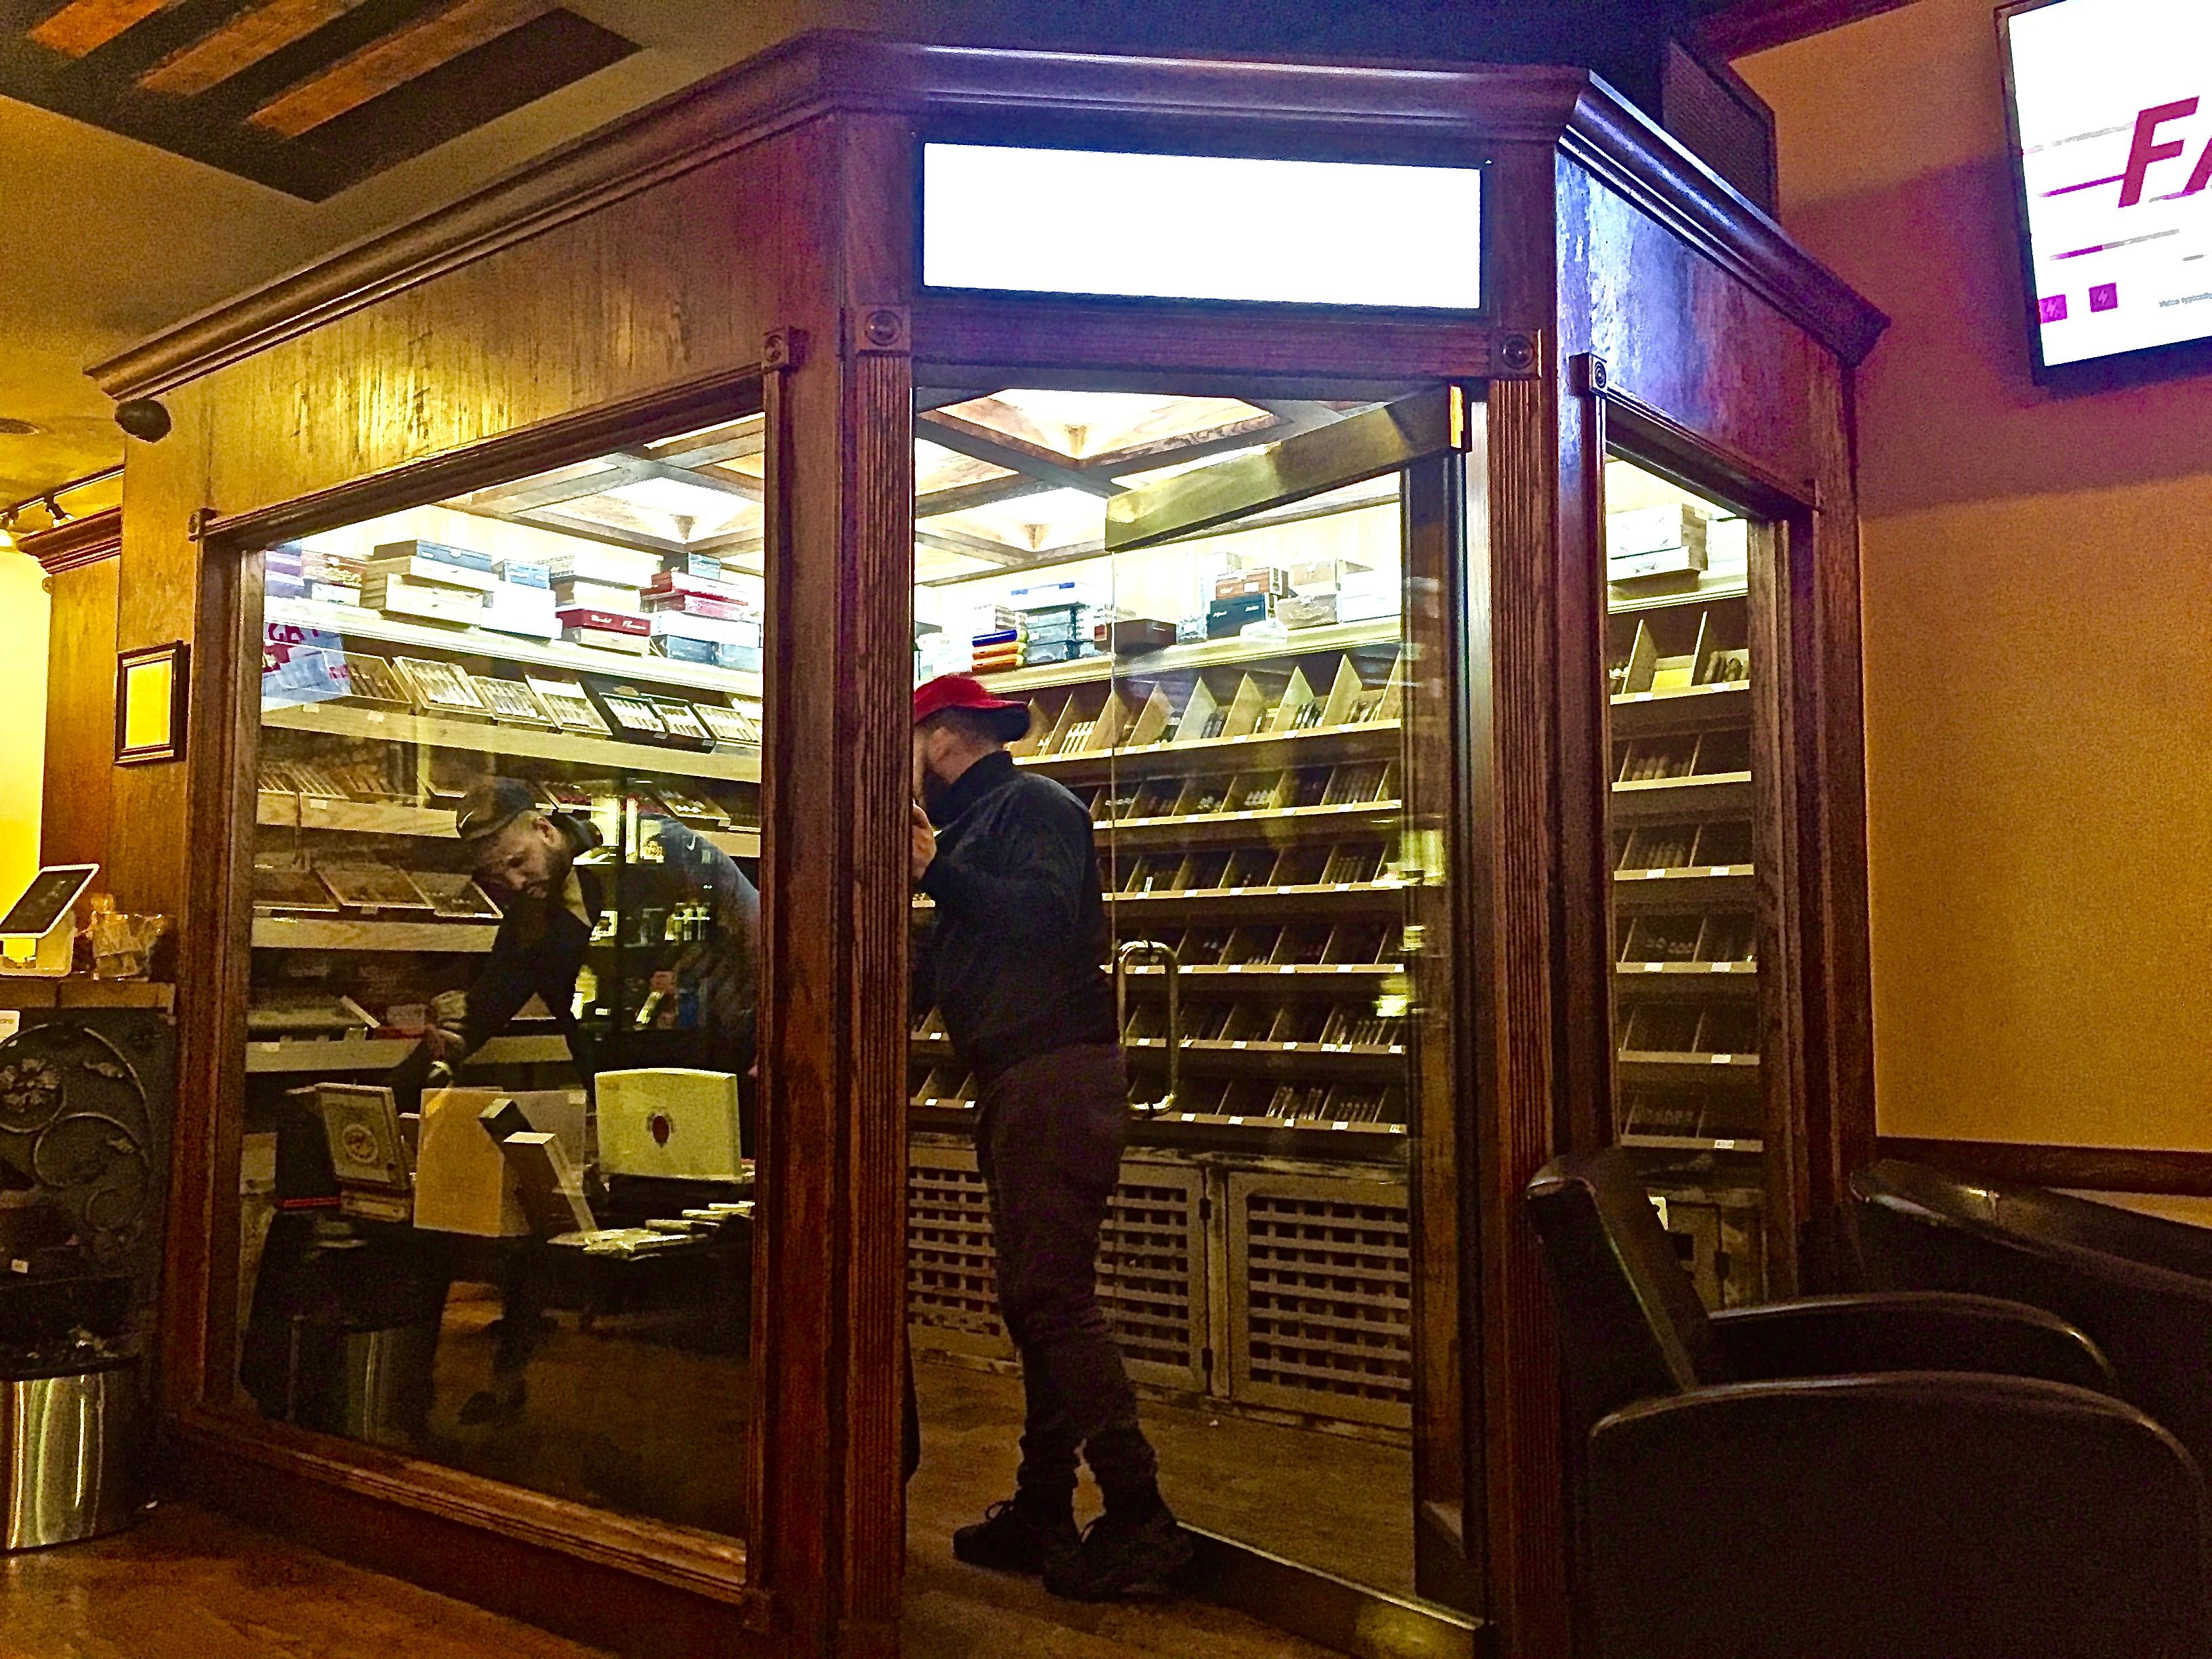 Papa Juan Cigar Room Bronx